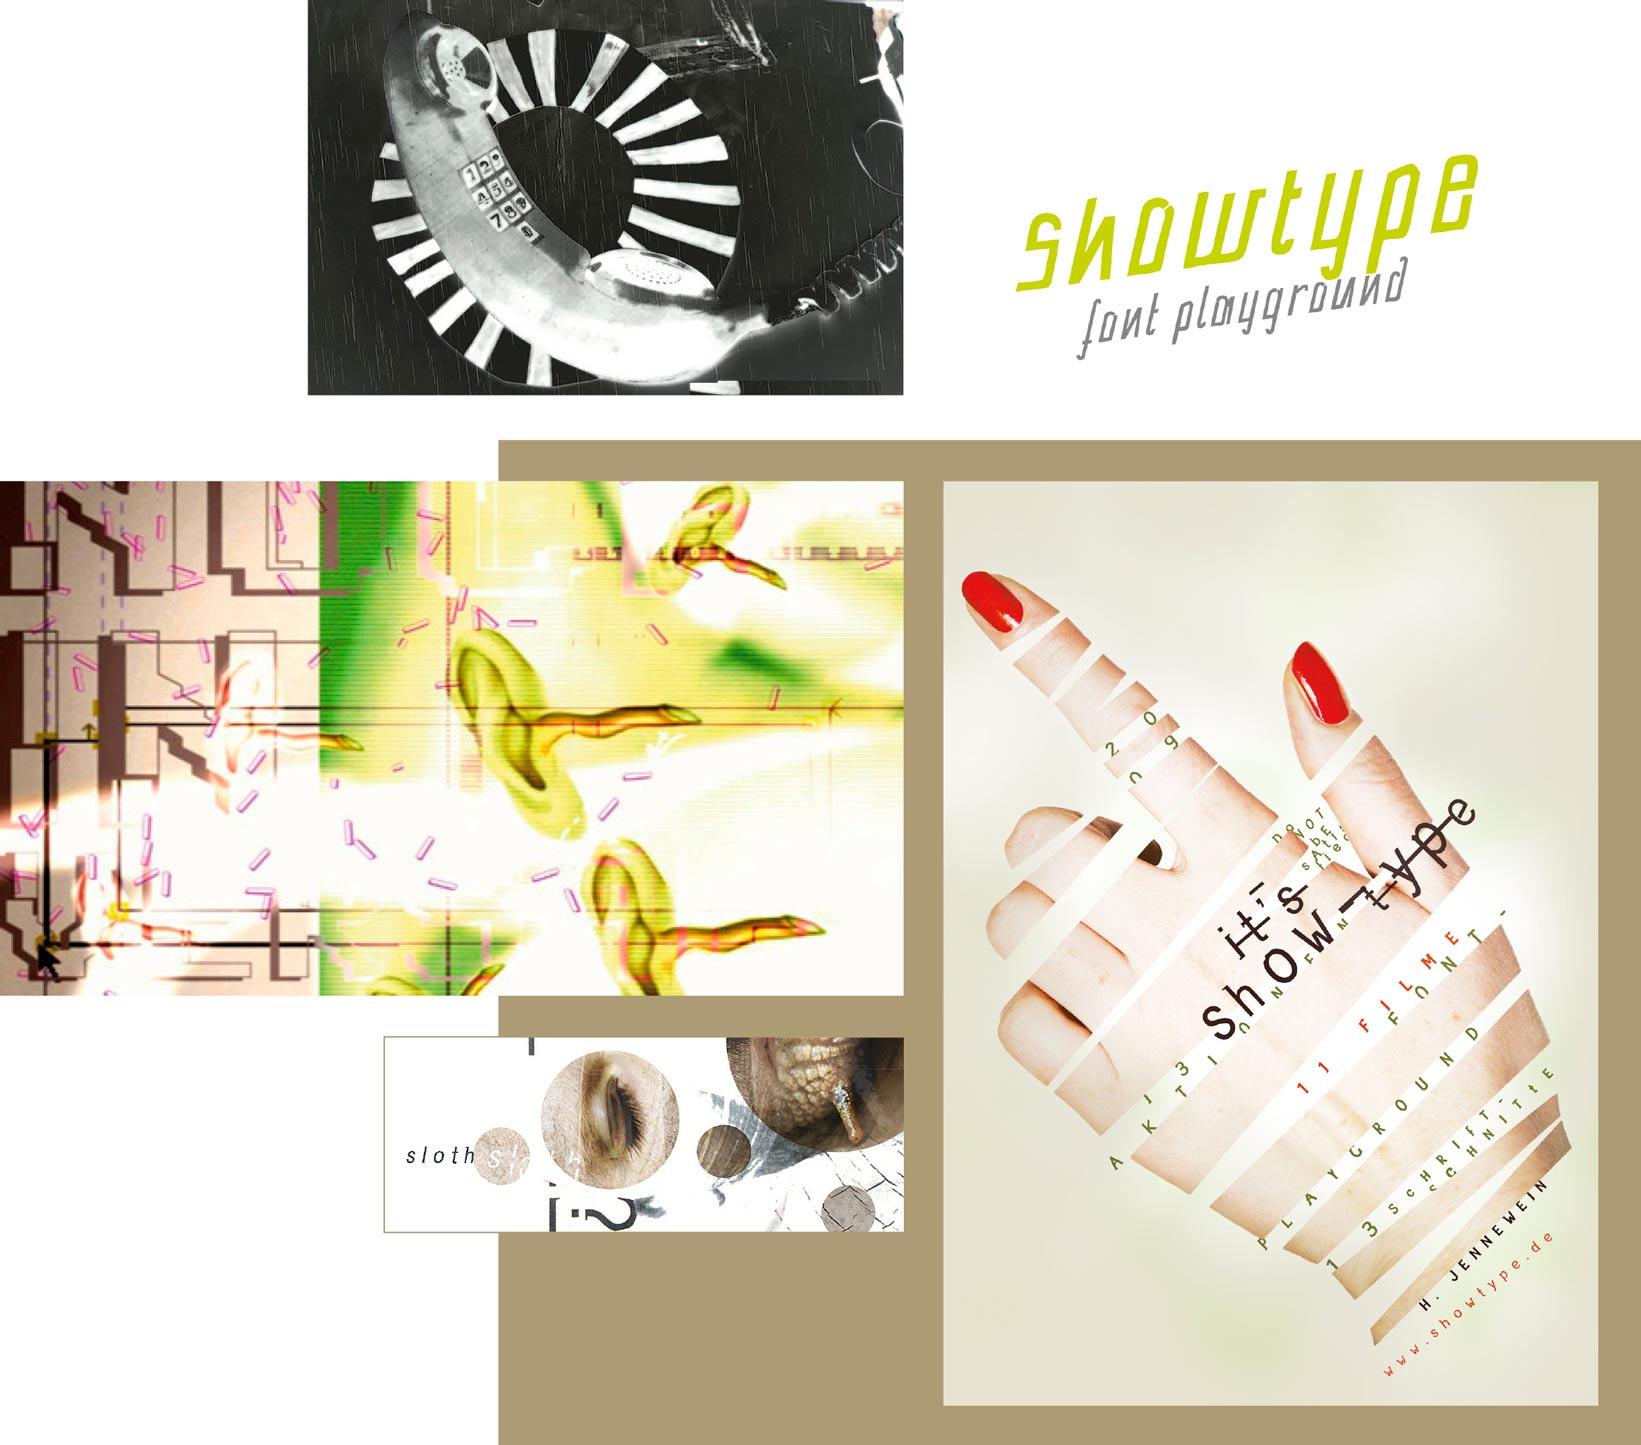 showtype, fontplayground 2009